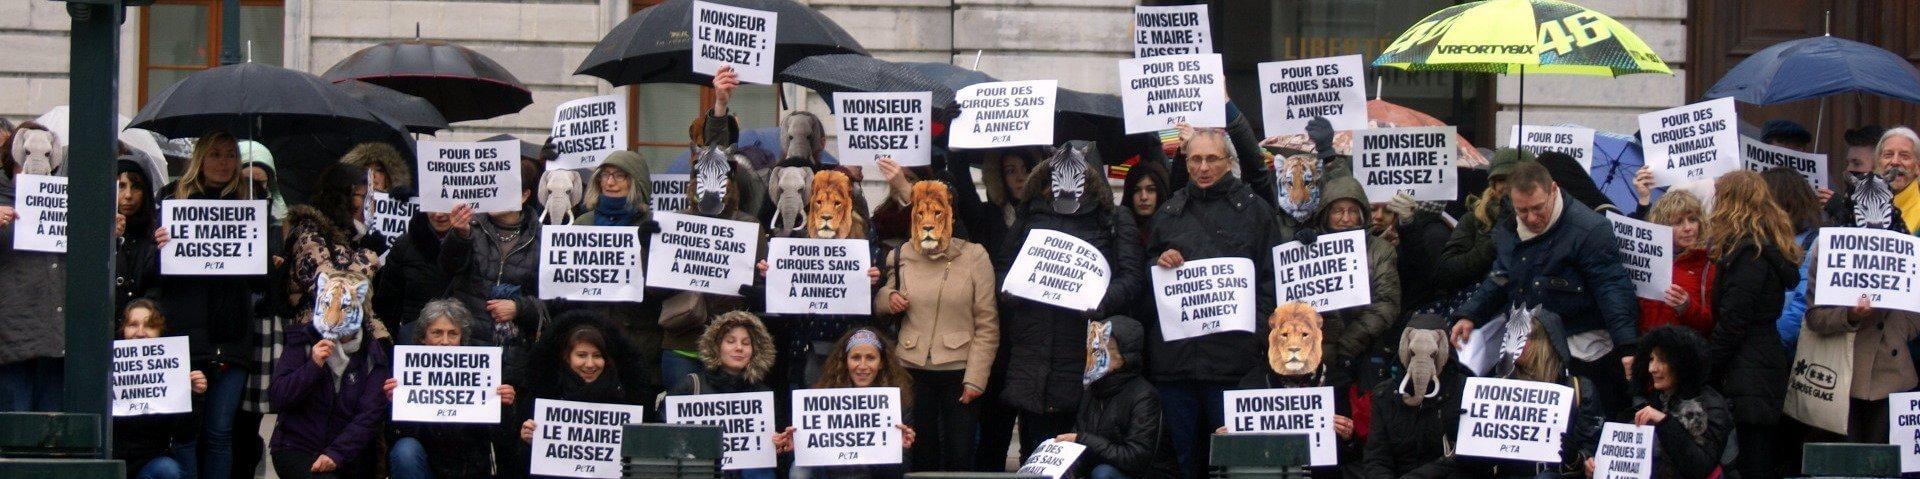 Image shows circus demonstration